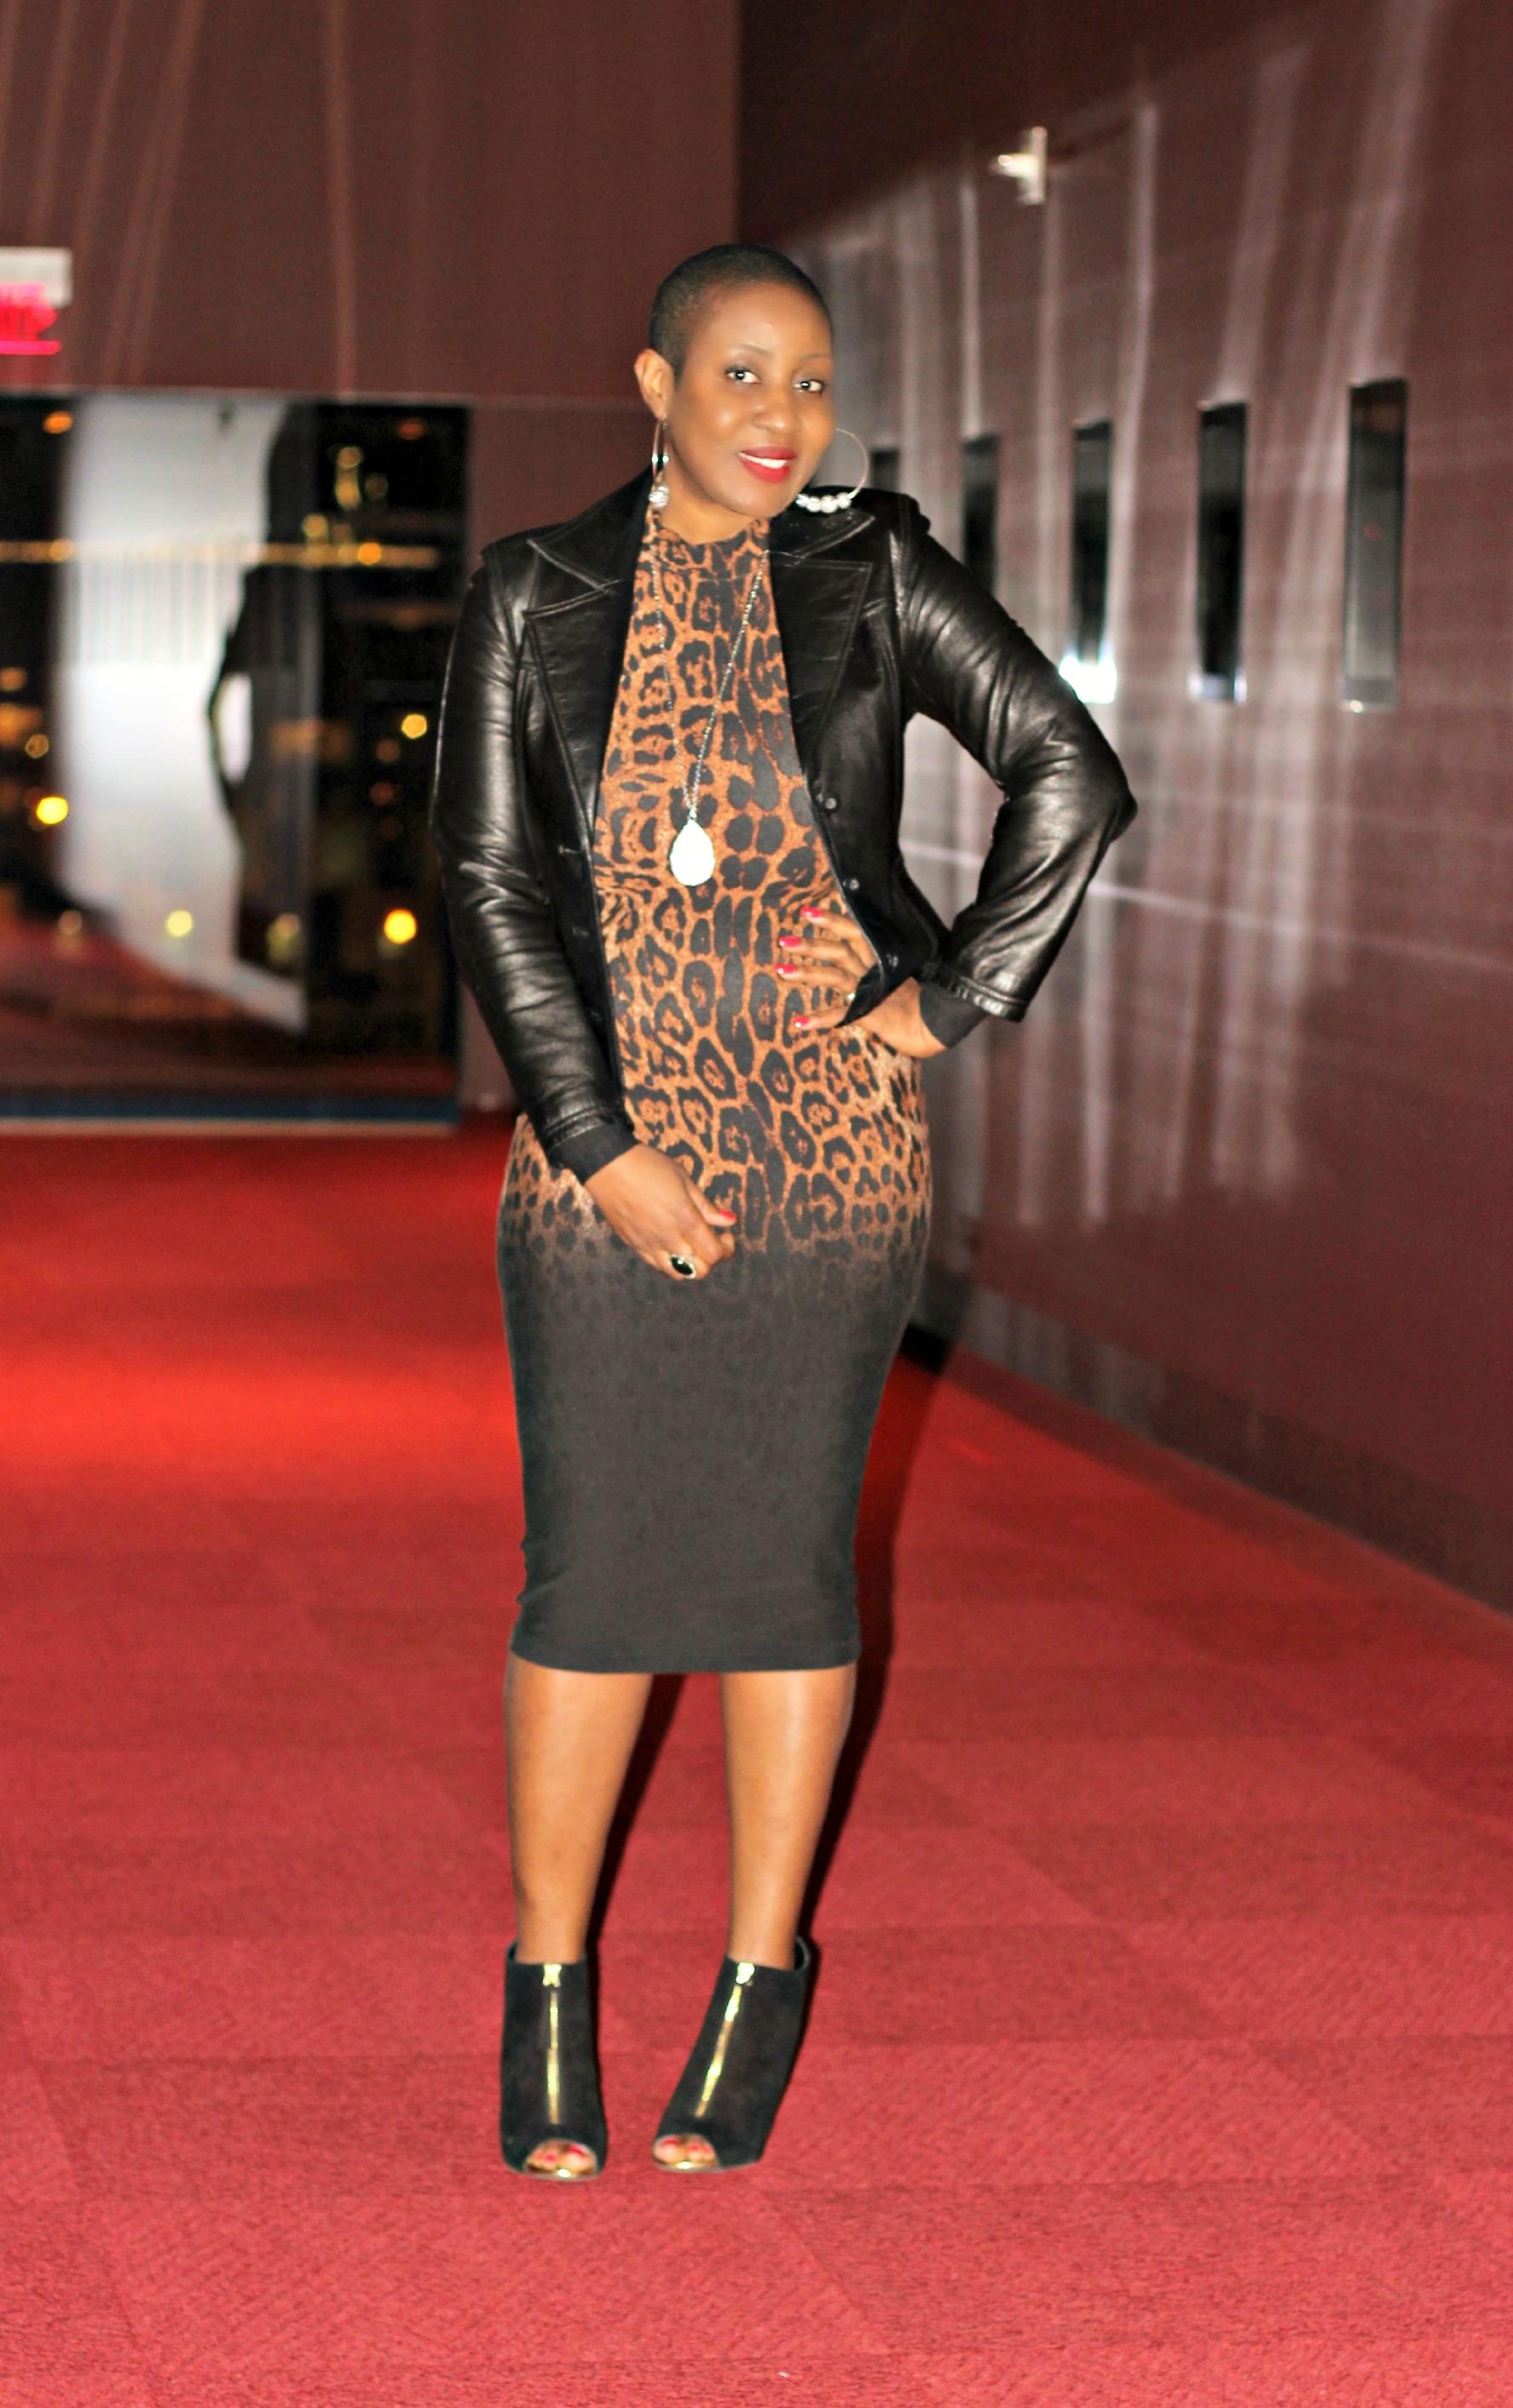 Leopard Bodycon Midi Dress Hypnoz Glam